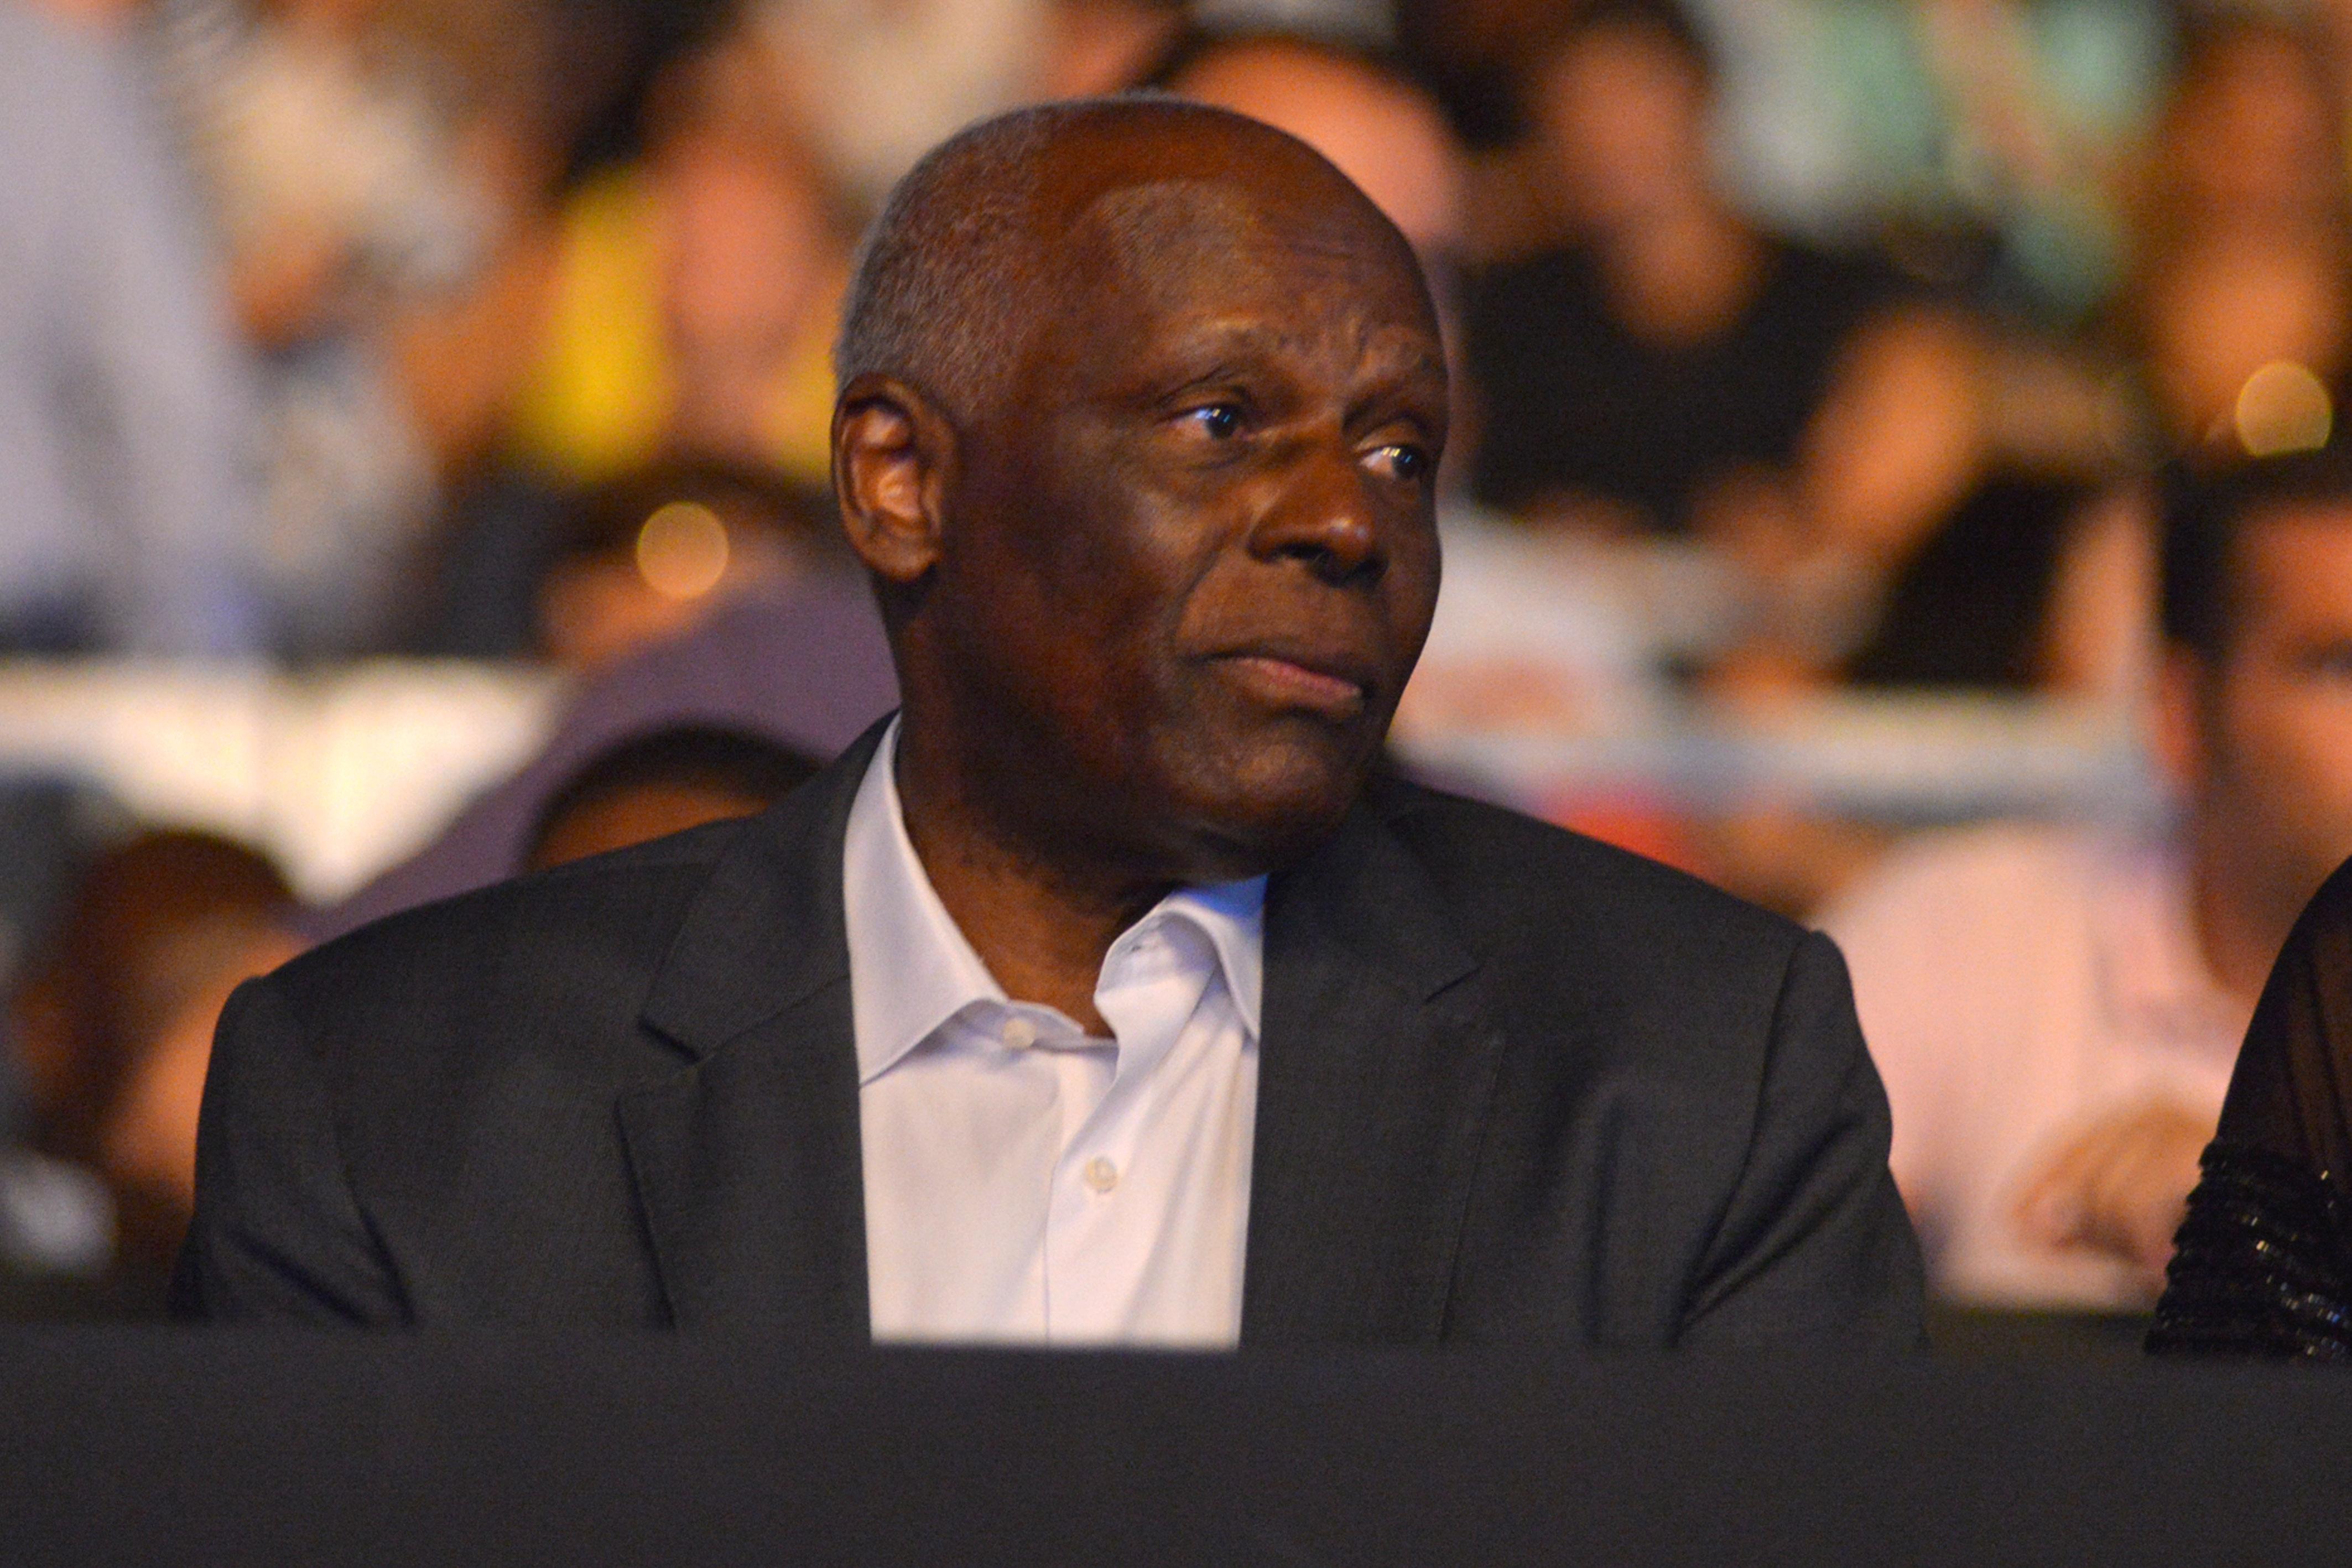 Presidente de Angola, José Eduardo dos Santos, enfrenta nova crise